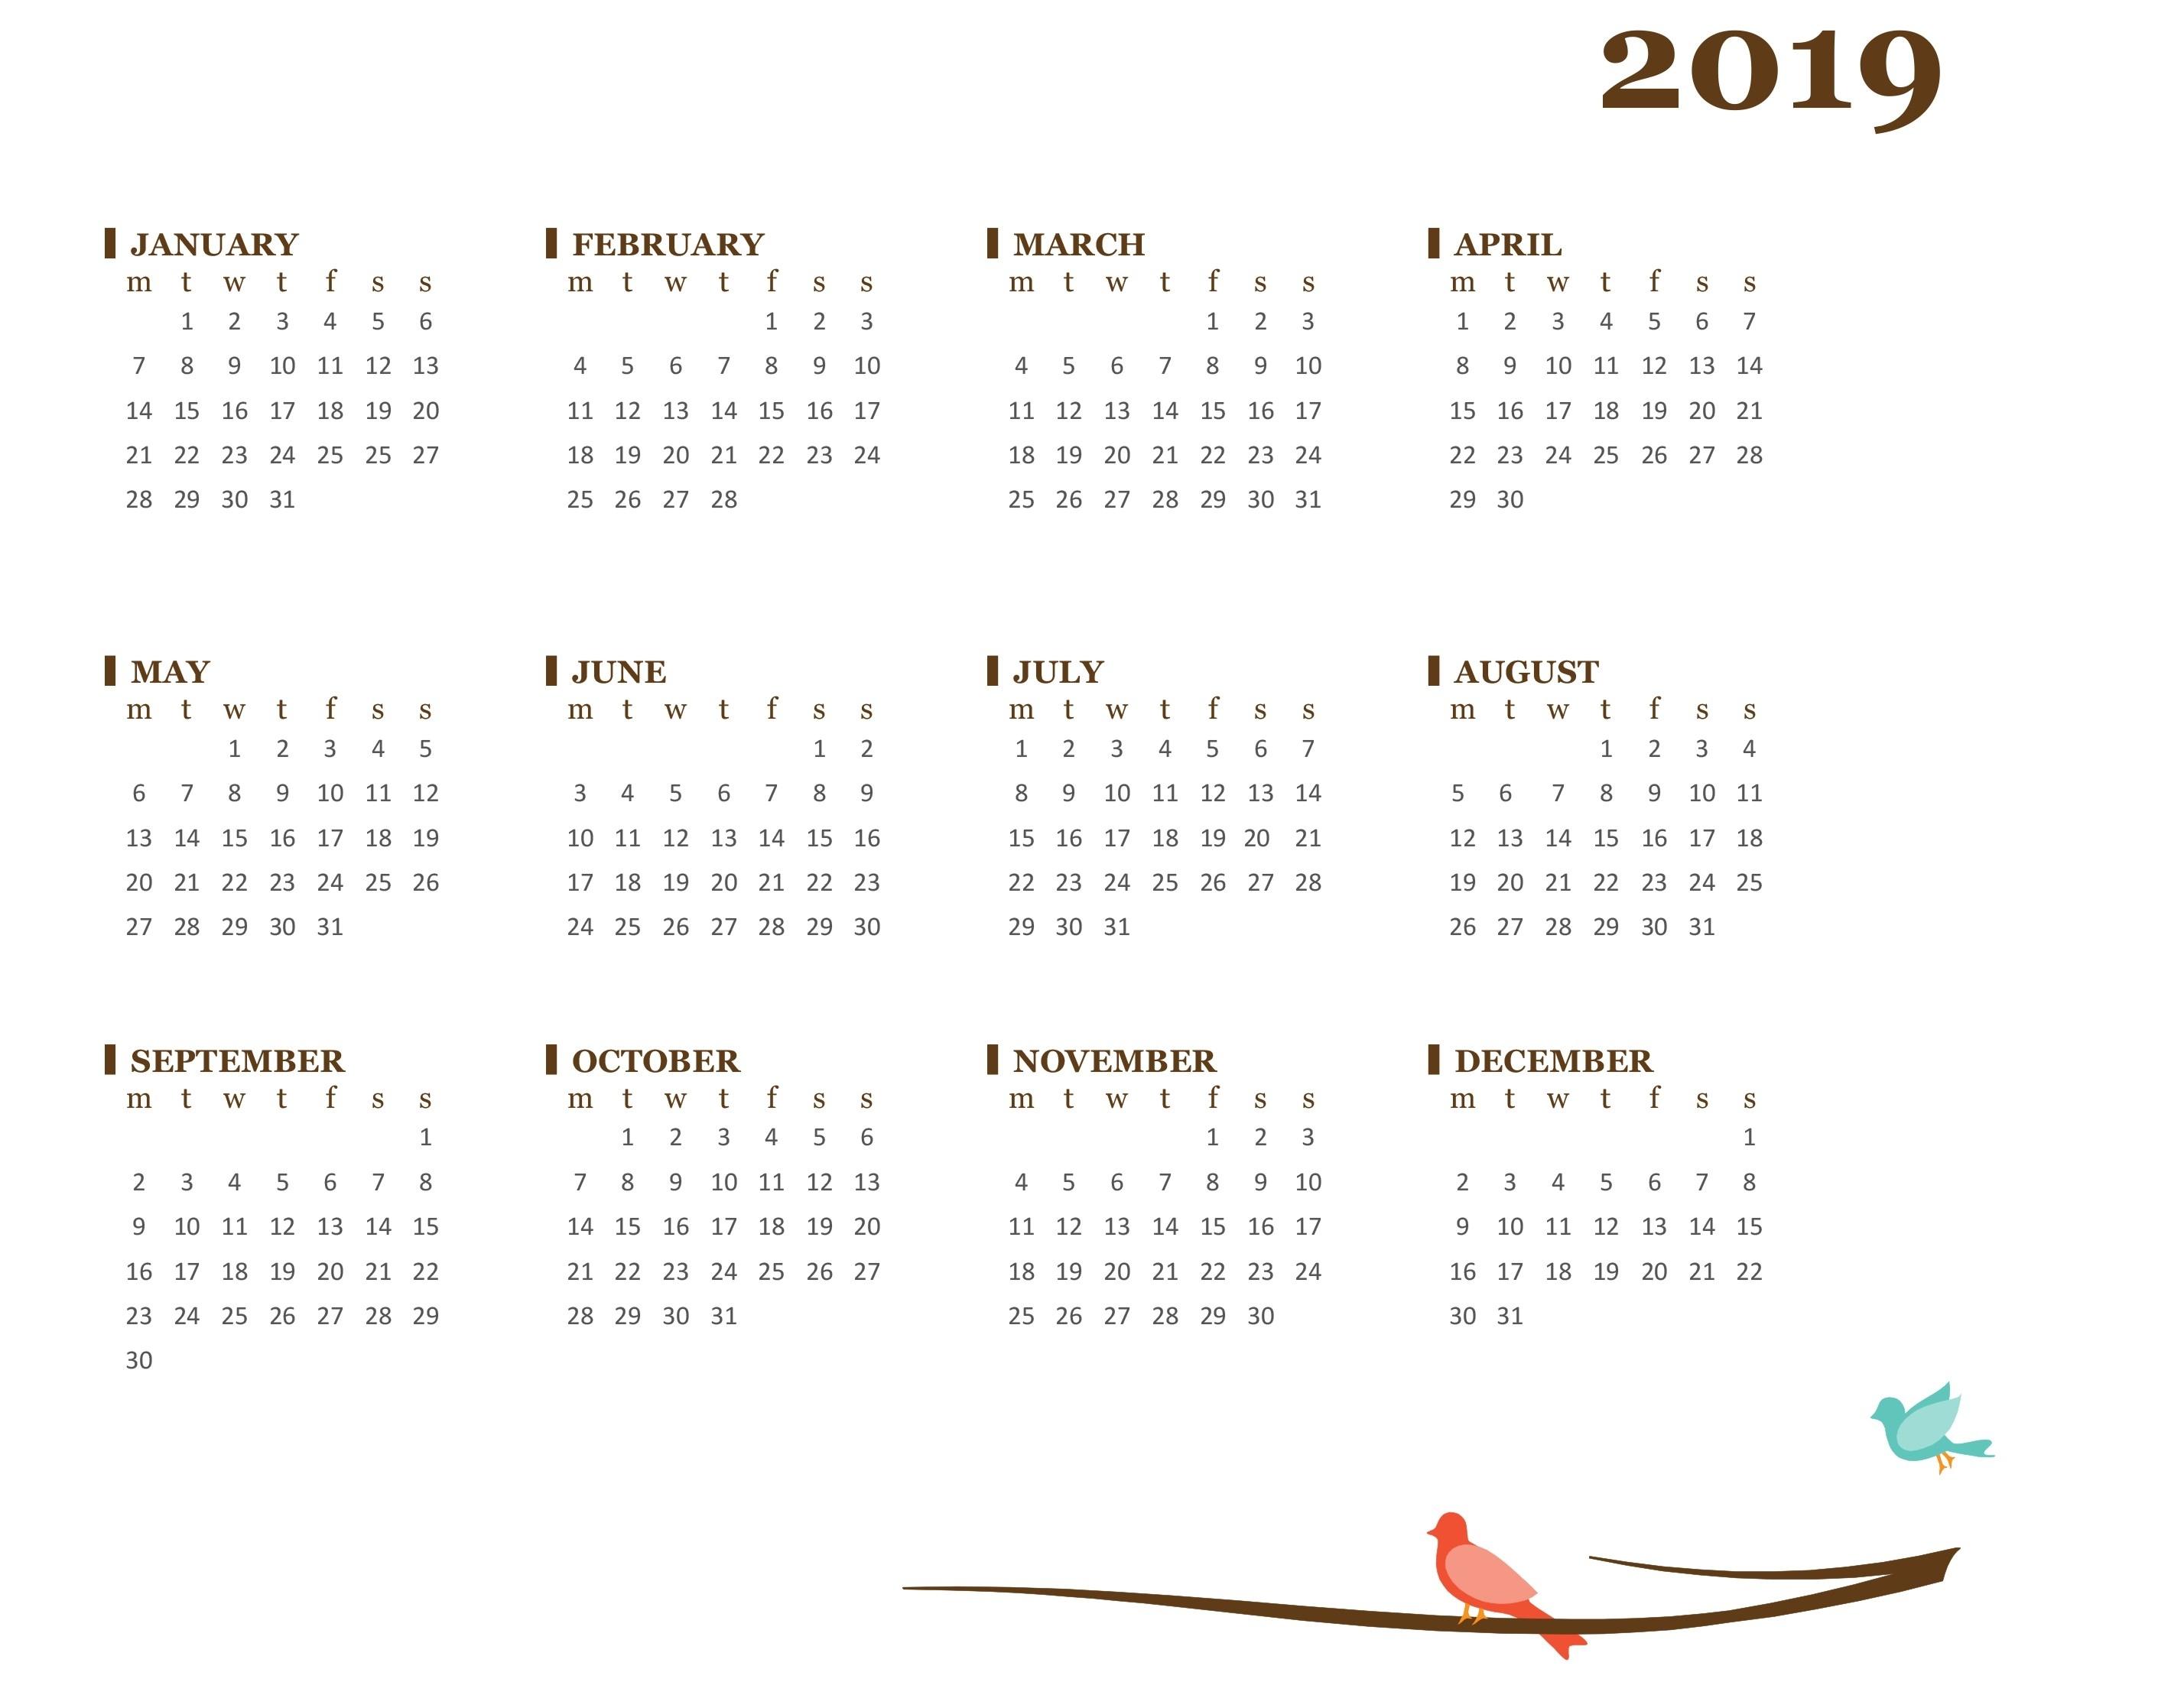 2019 Yearly Calendar (Mon-Sun) regarding Frame Birthday Calendar Templates Free